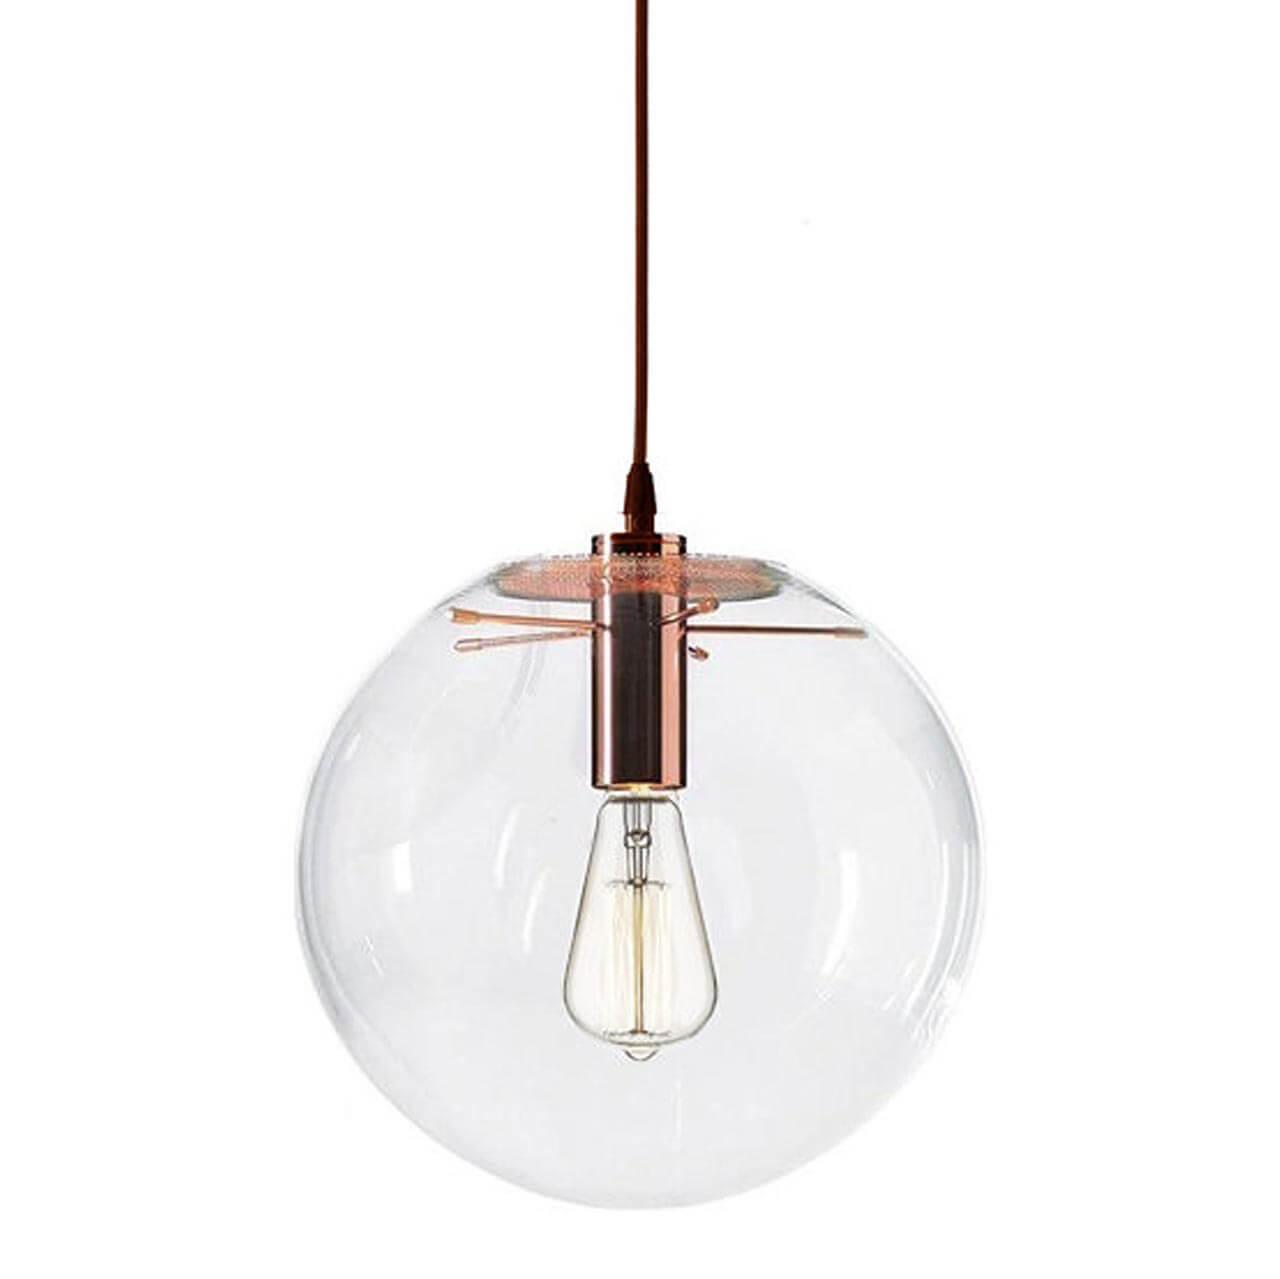 цена на Светильник Kink Light 07564-20,21 Меркурий